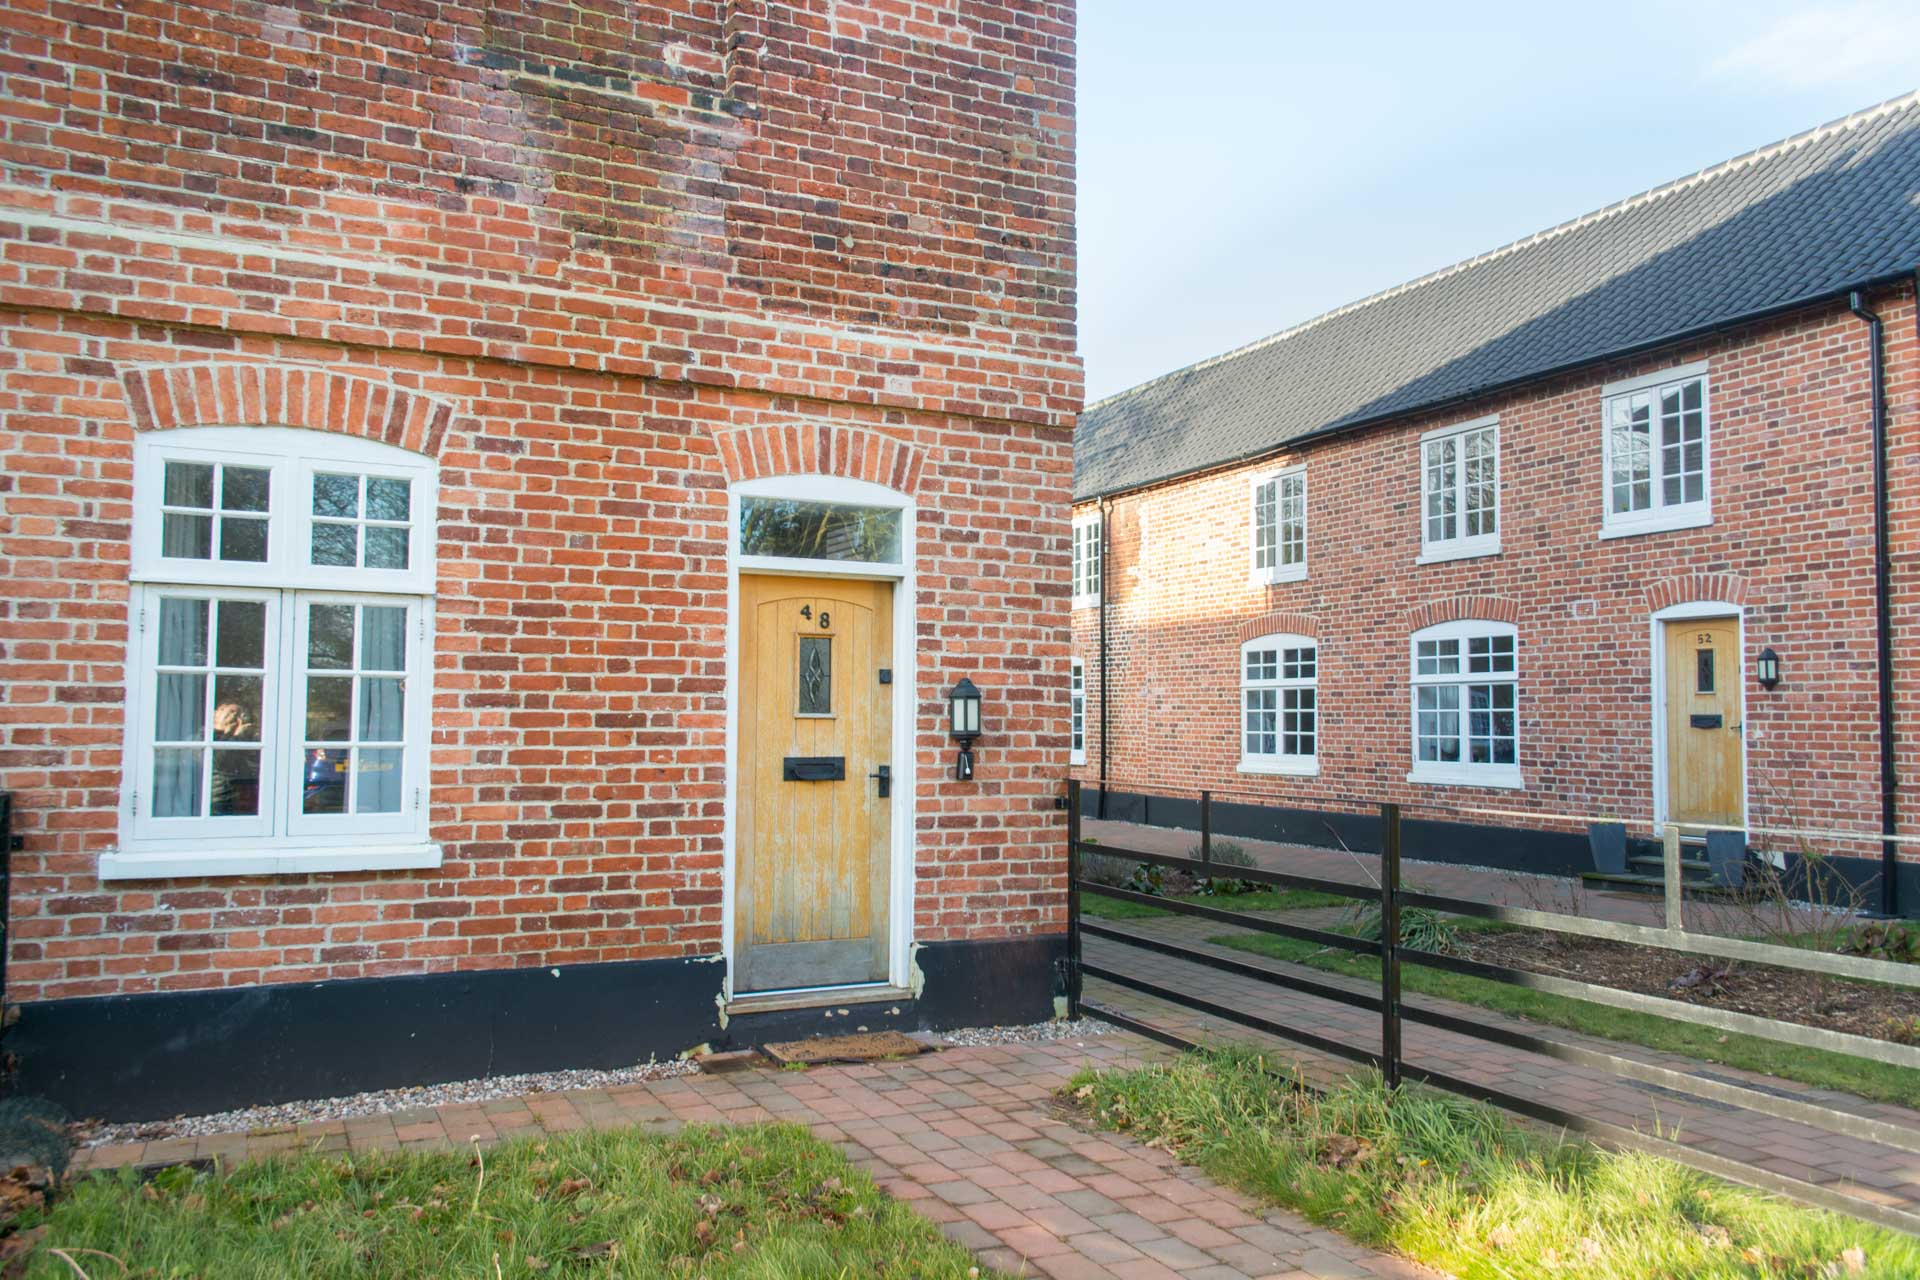 Heckingham park front garden area and property entrance.